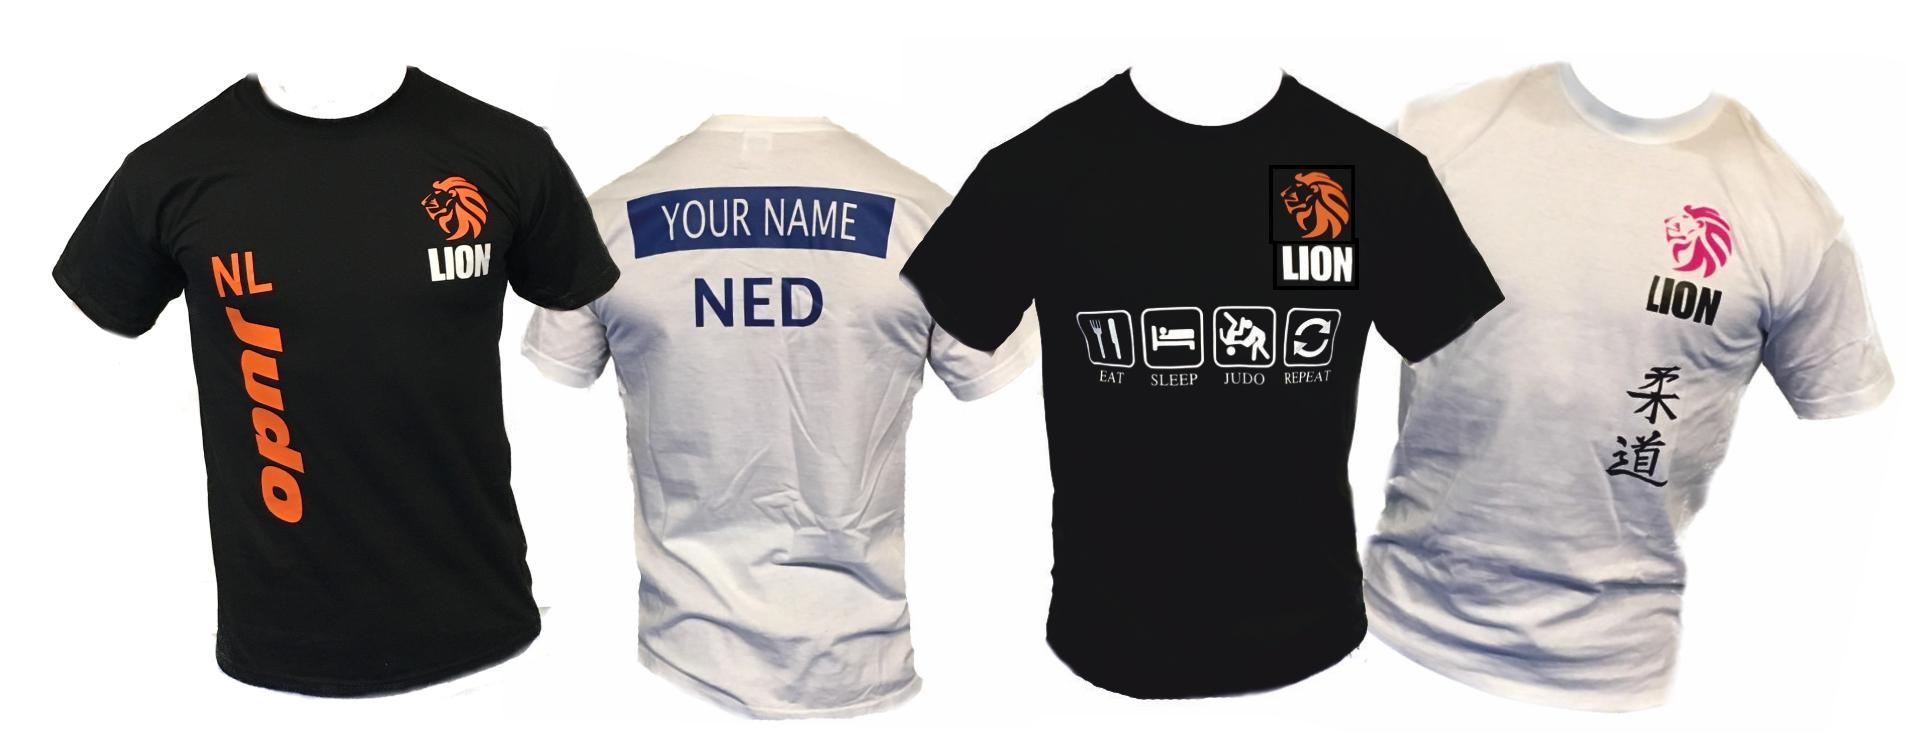 https://nieuwjudopak.nl/wp-content/uploads/2017/09/shop-home-gallery-banner-Judo-T-shirts-Nieuw-Judopak.jpg